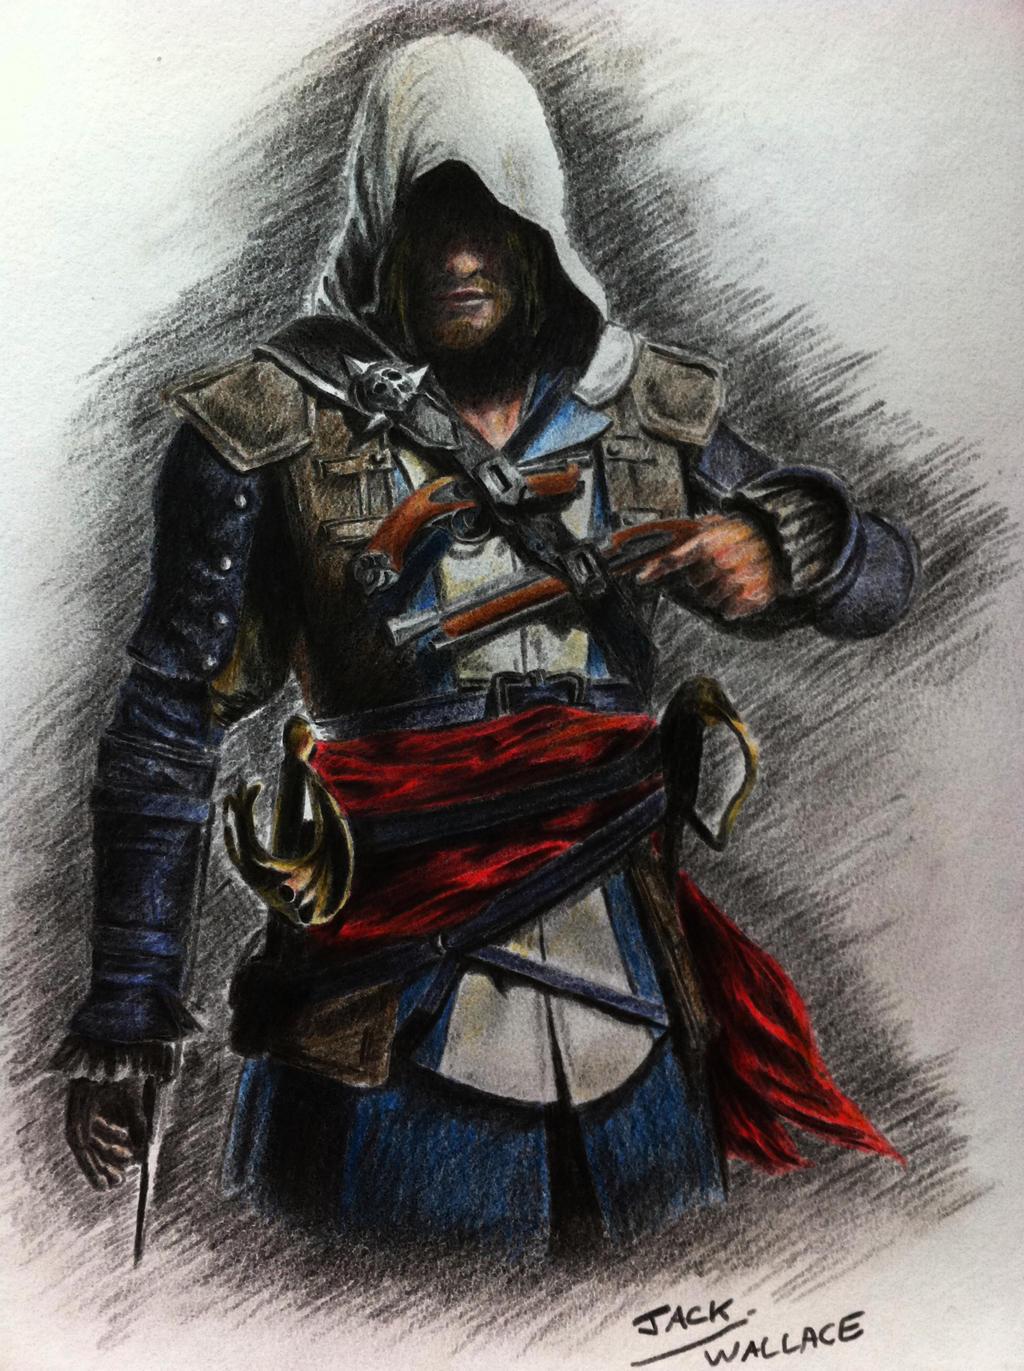 Jakaś cycata panna pragnąca pomagać pokemonom(Lunaa) - Page 5 Assassin_s_creed_4__black_flag___edward_kenway_by_hybrid_theory101-d5zrhcl